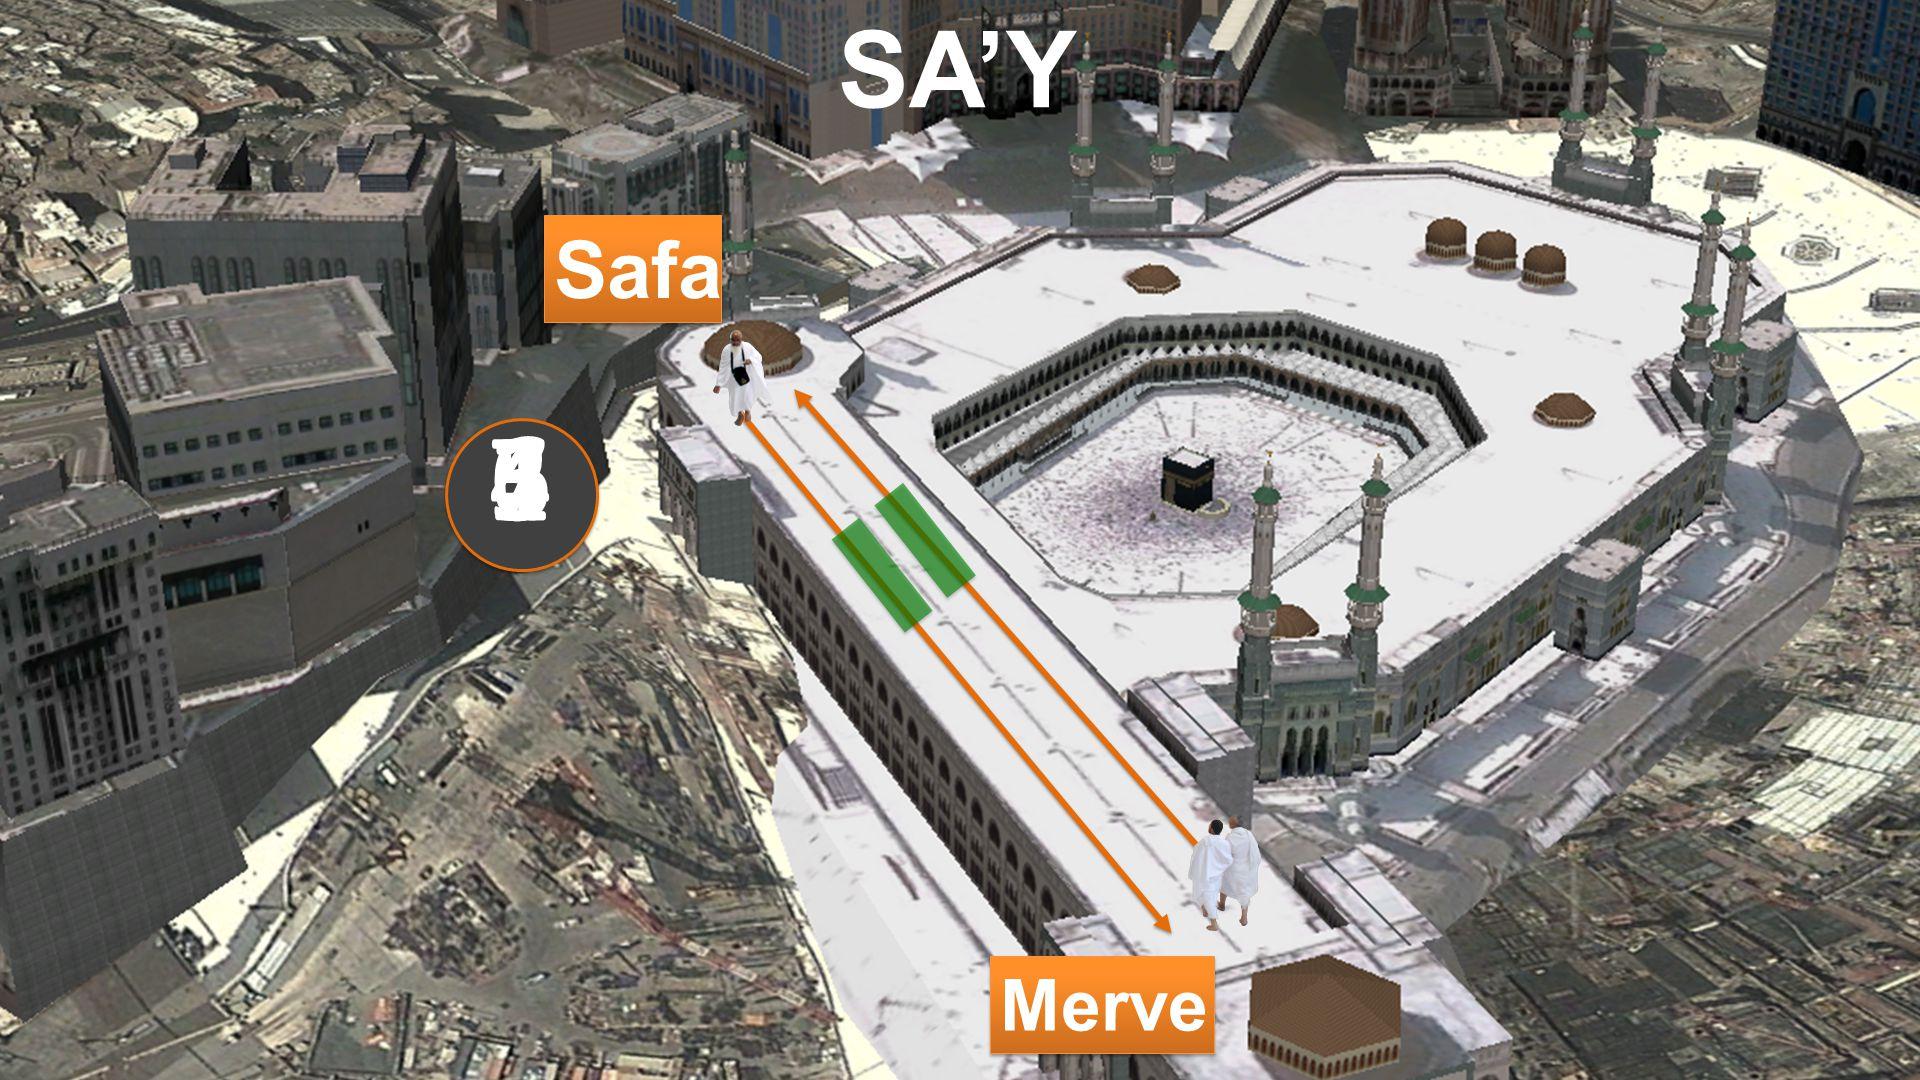 SA'Y 1 2 345 6 7 Safa Merve